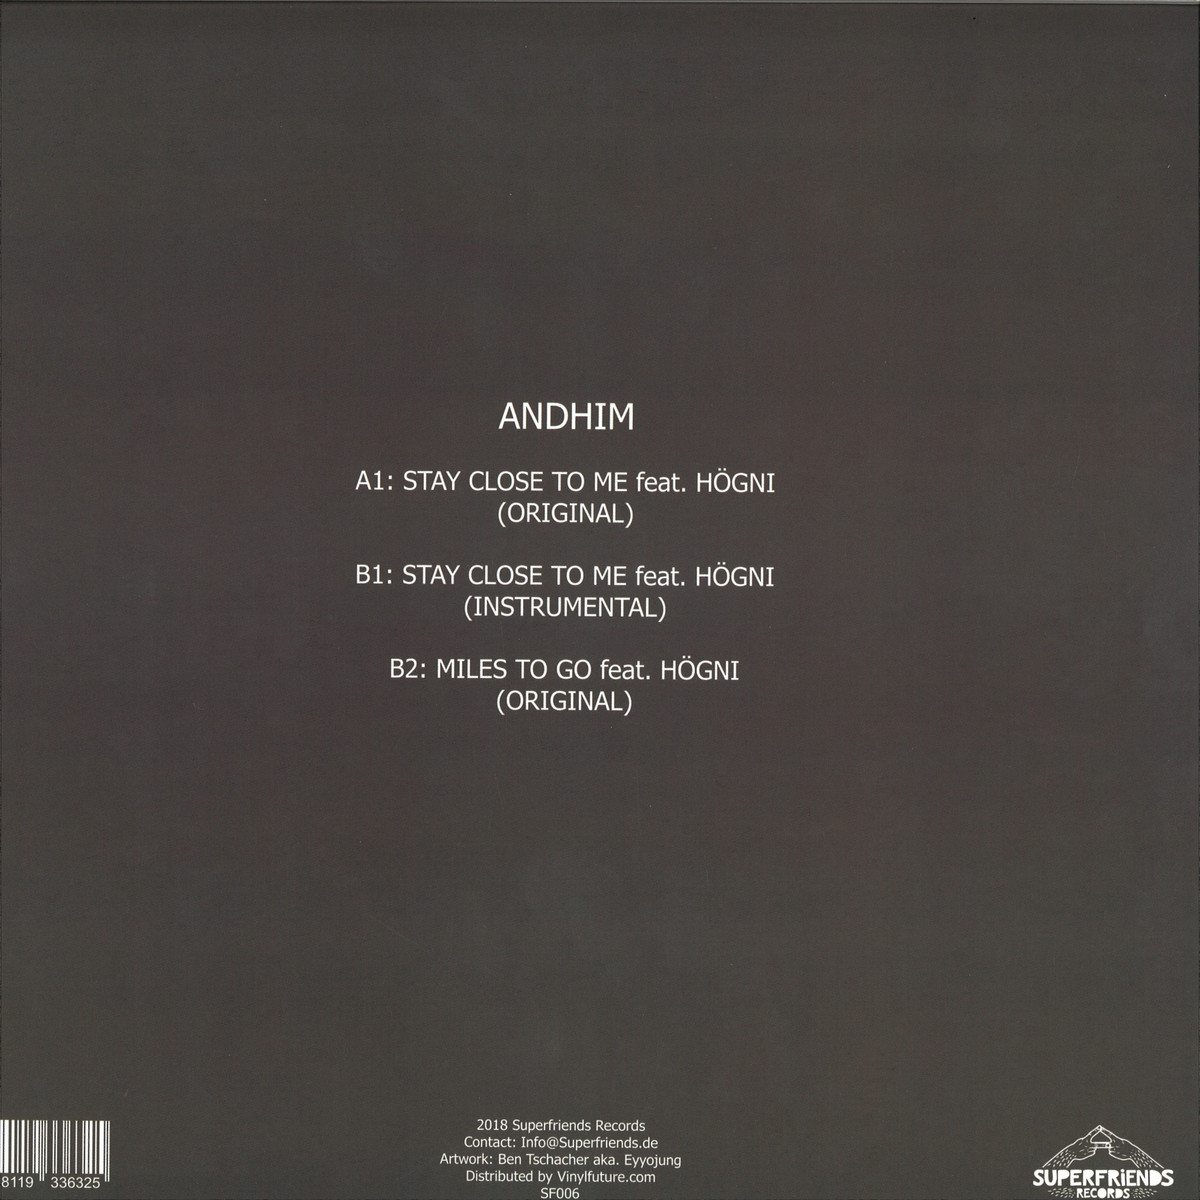 Andhim Feat. Högni - Stay Close To Me (Original Mix)